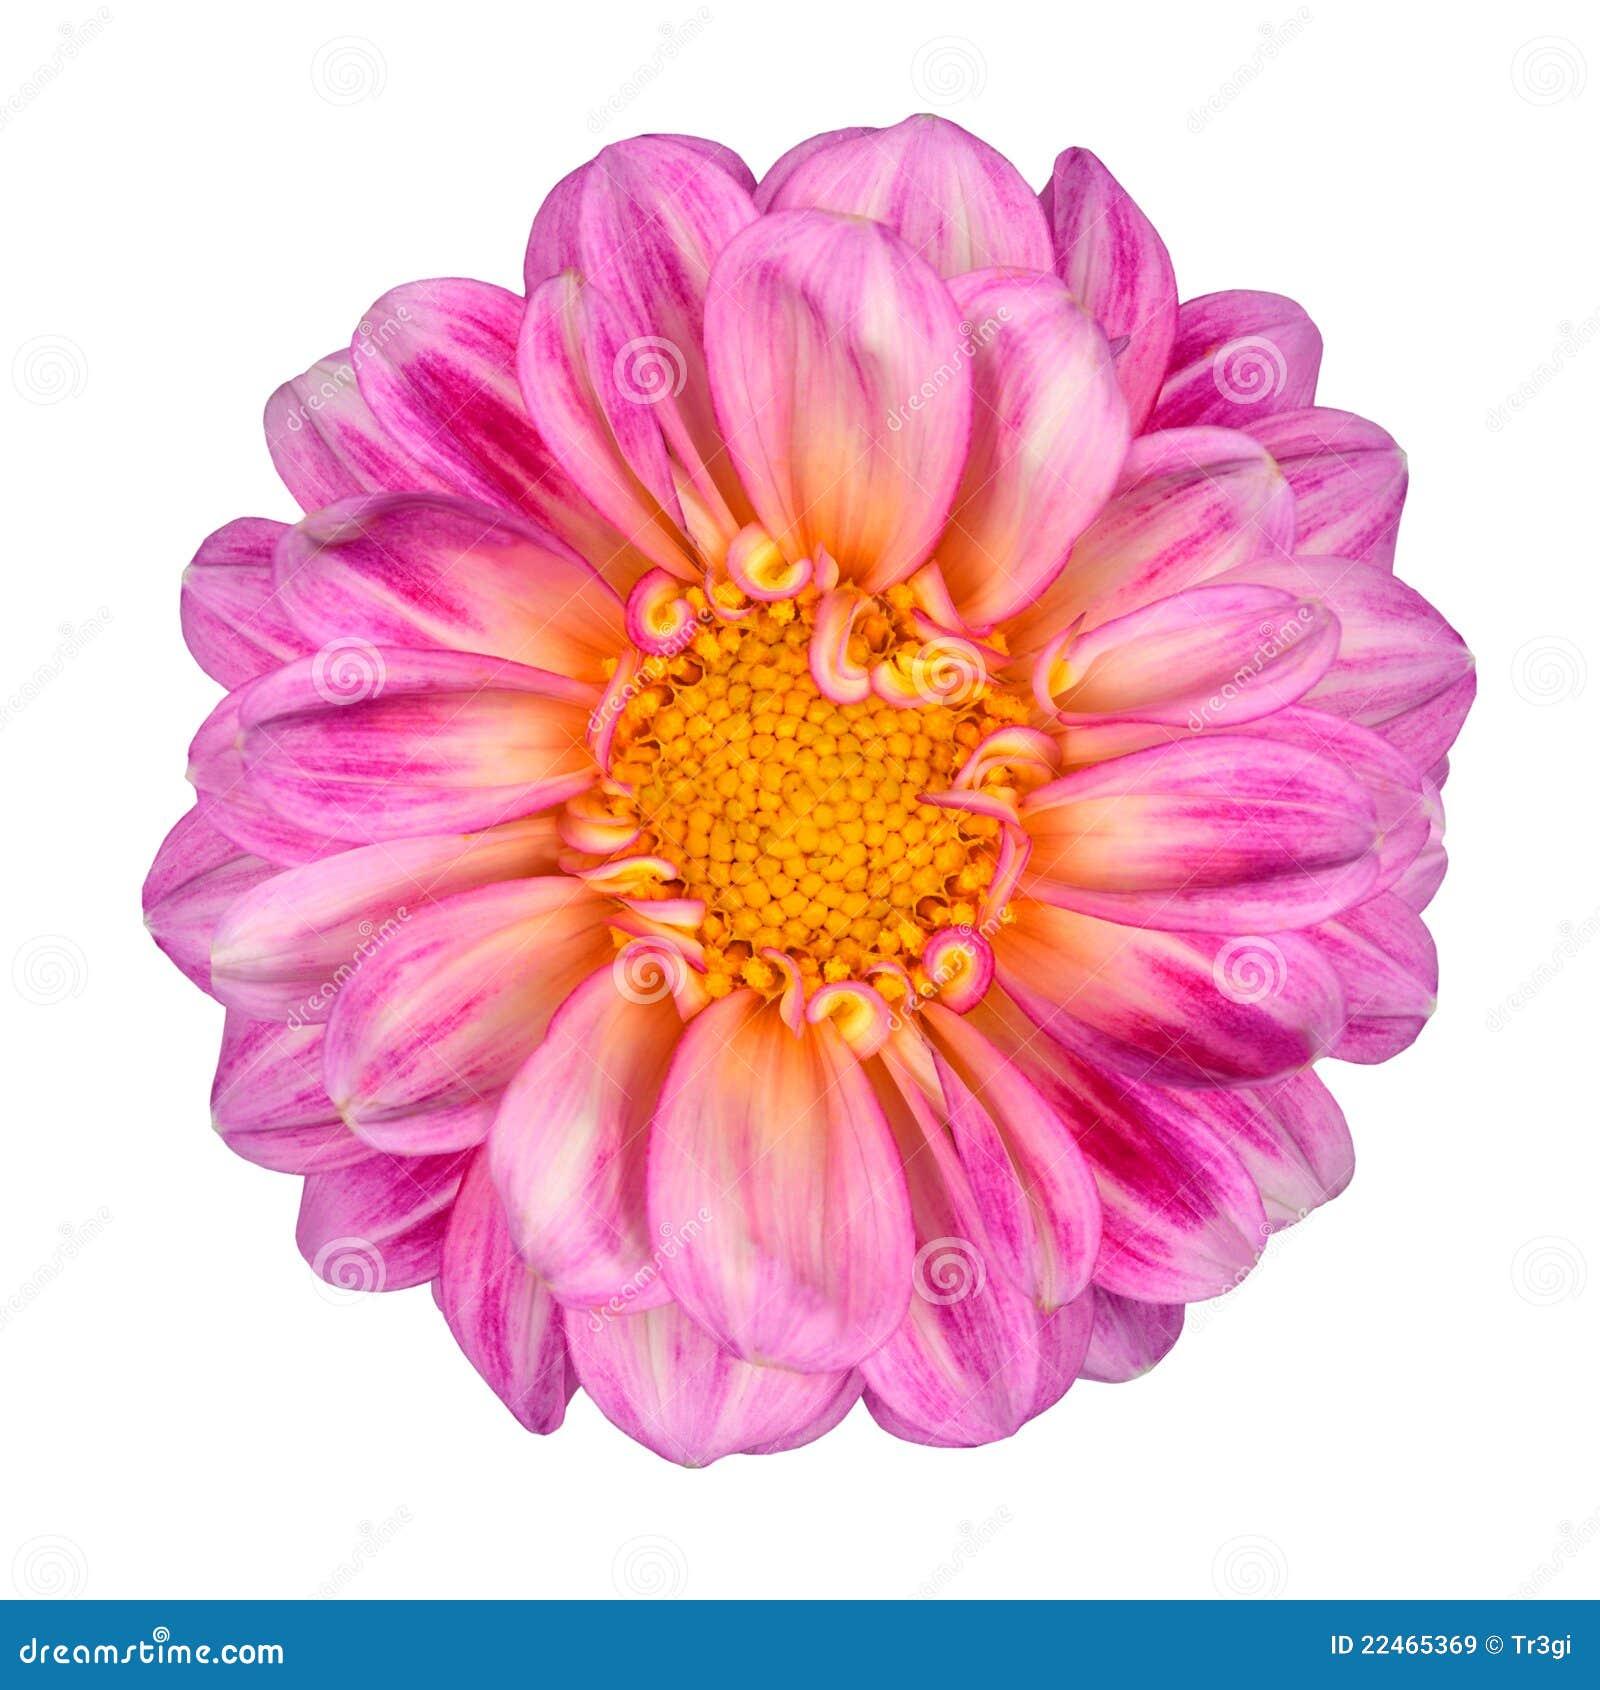 Pink white dahlia flower yellow center isolated stock image image pink white dahlia flower yellow center isolated mightylinksfo